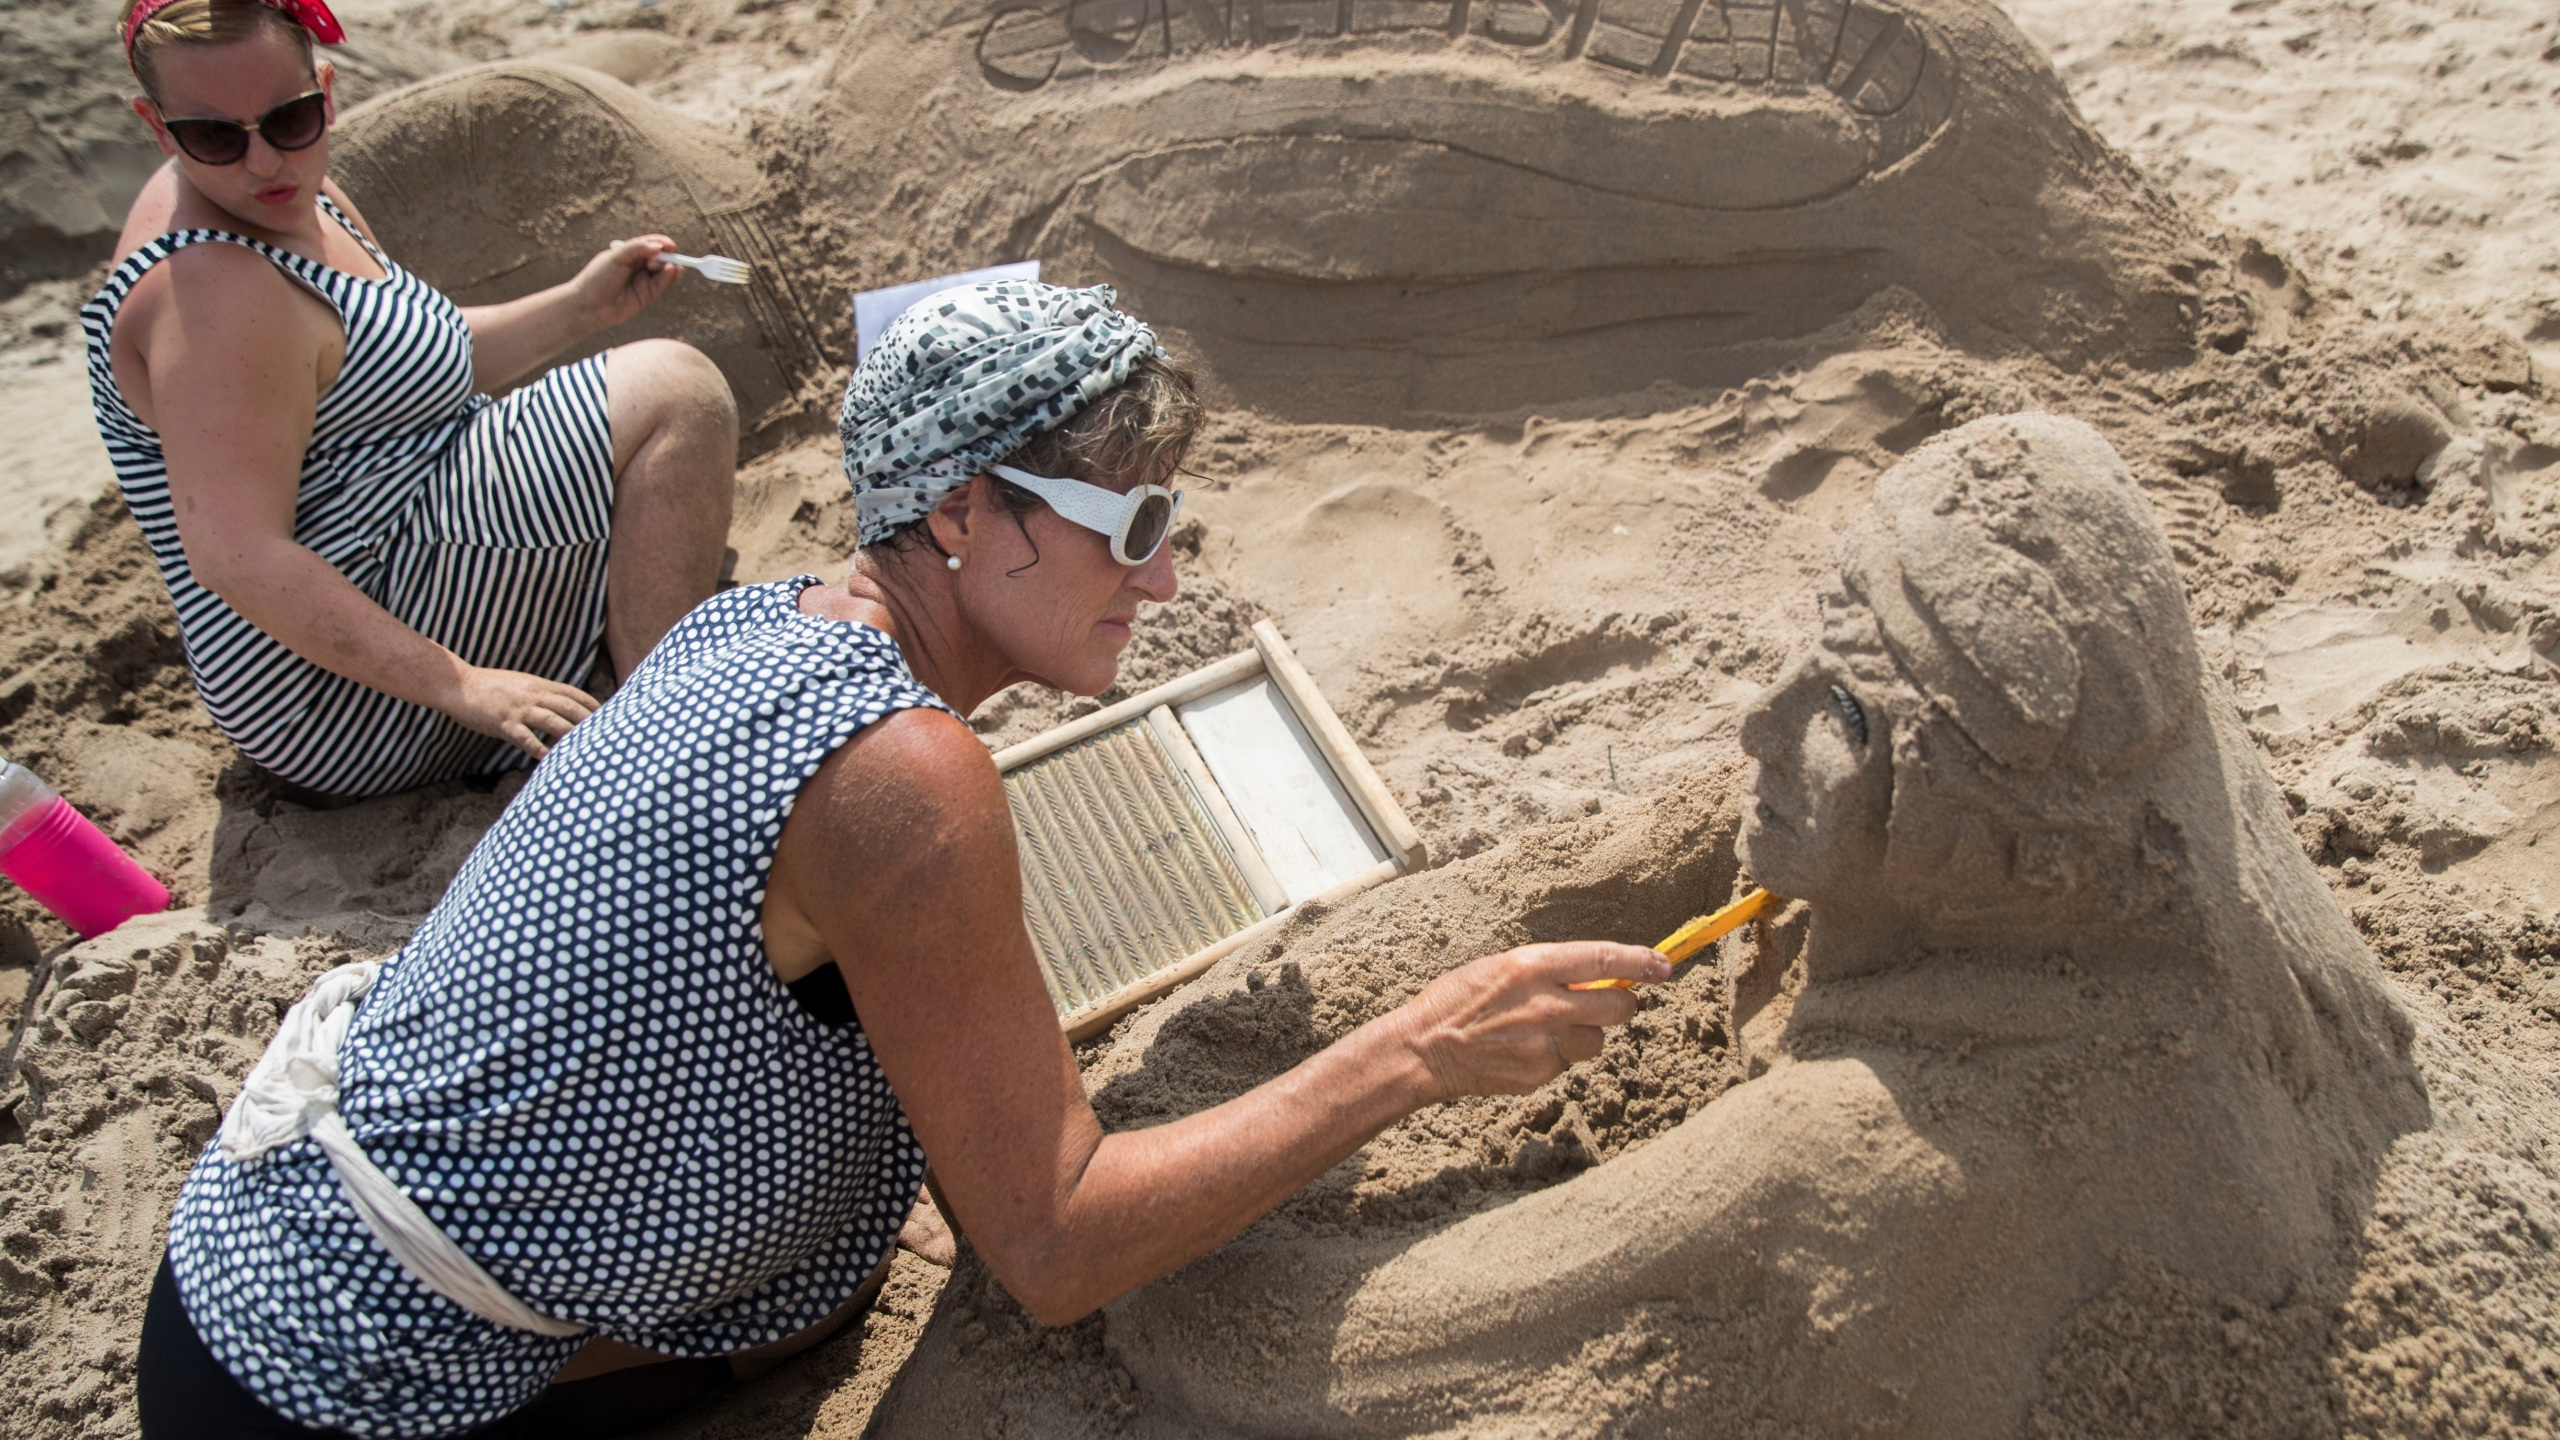 Coney Island Sand Sculpting